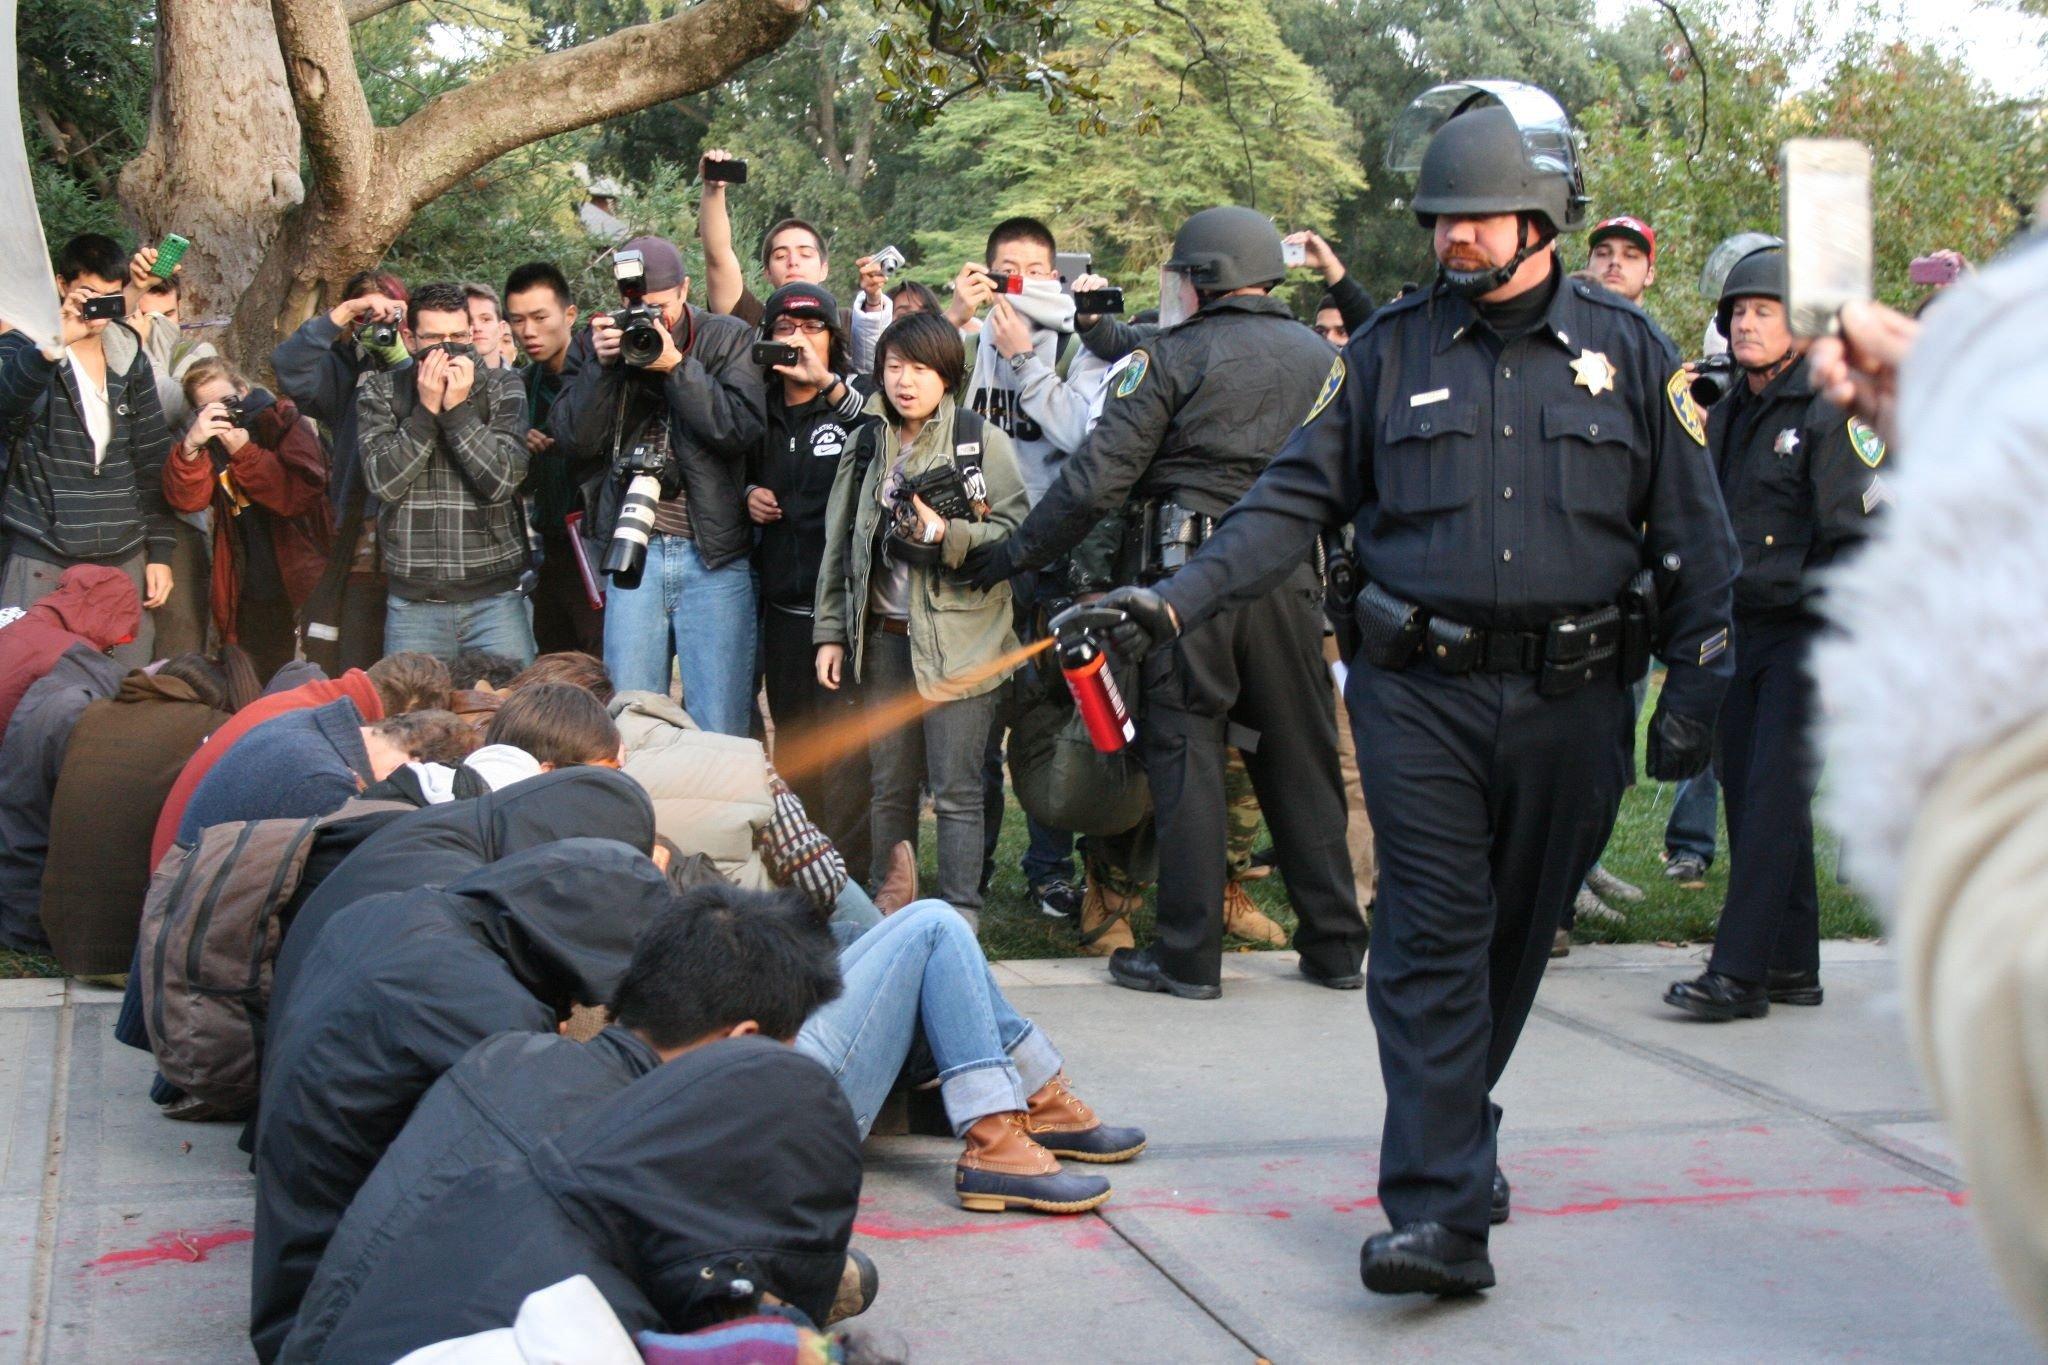 Argumentative essay about police brutality